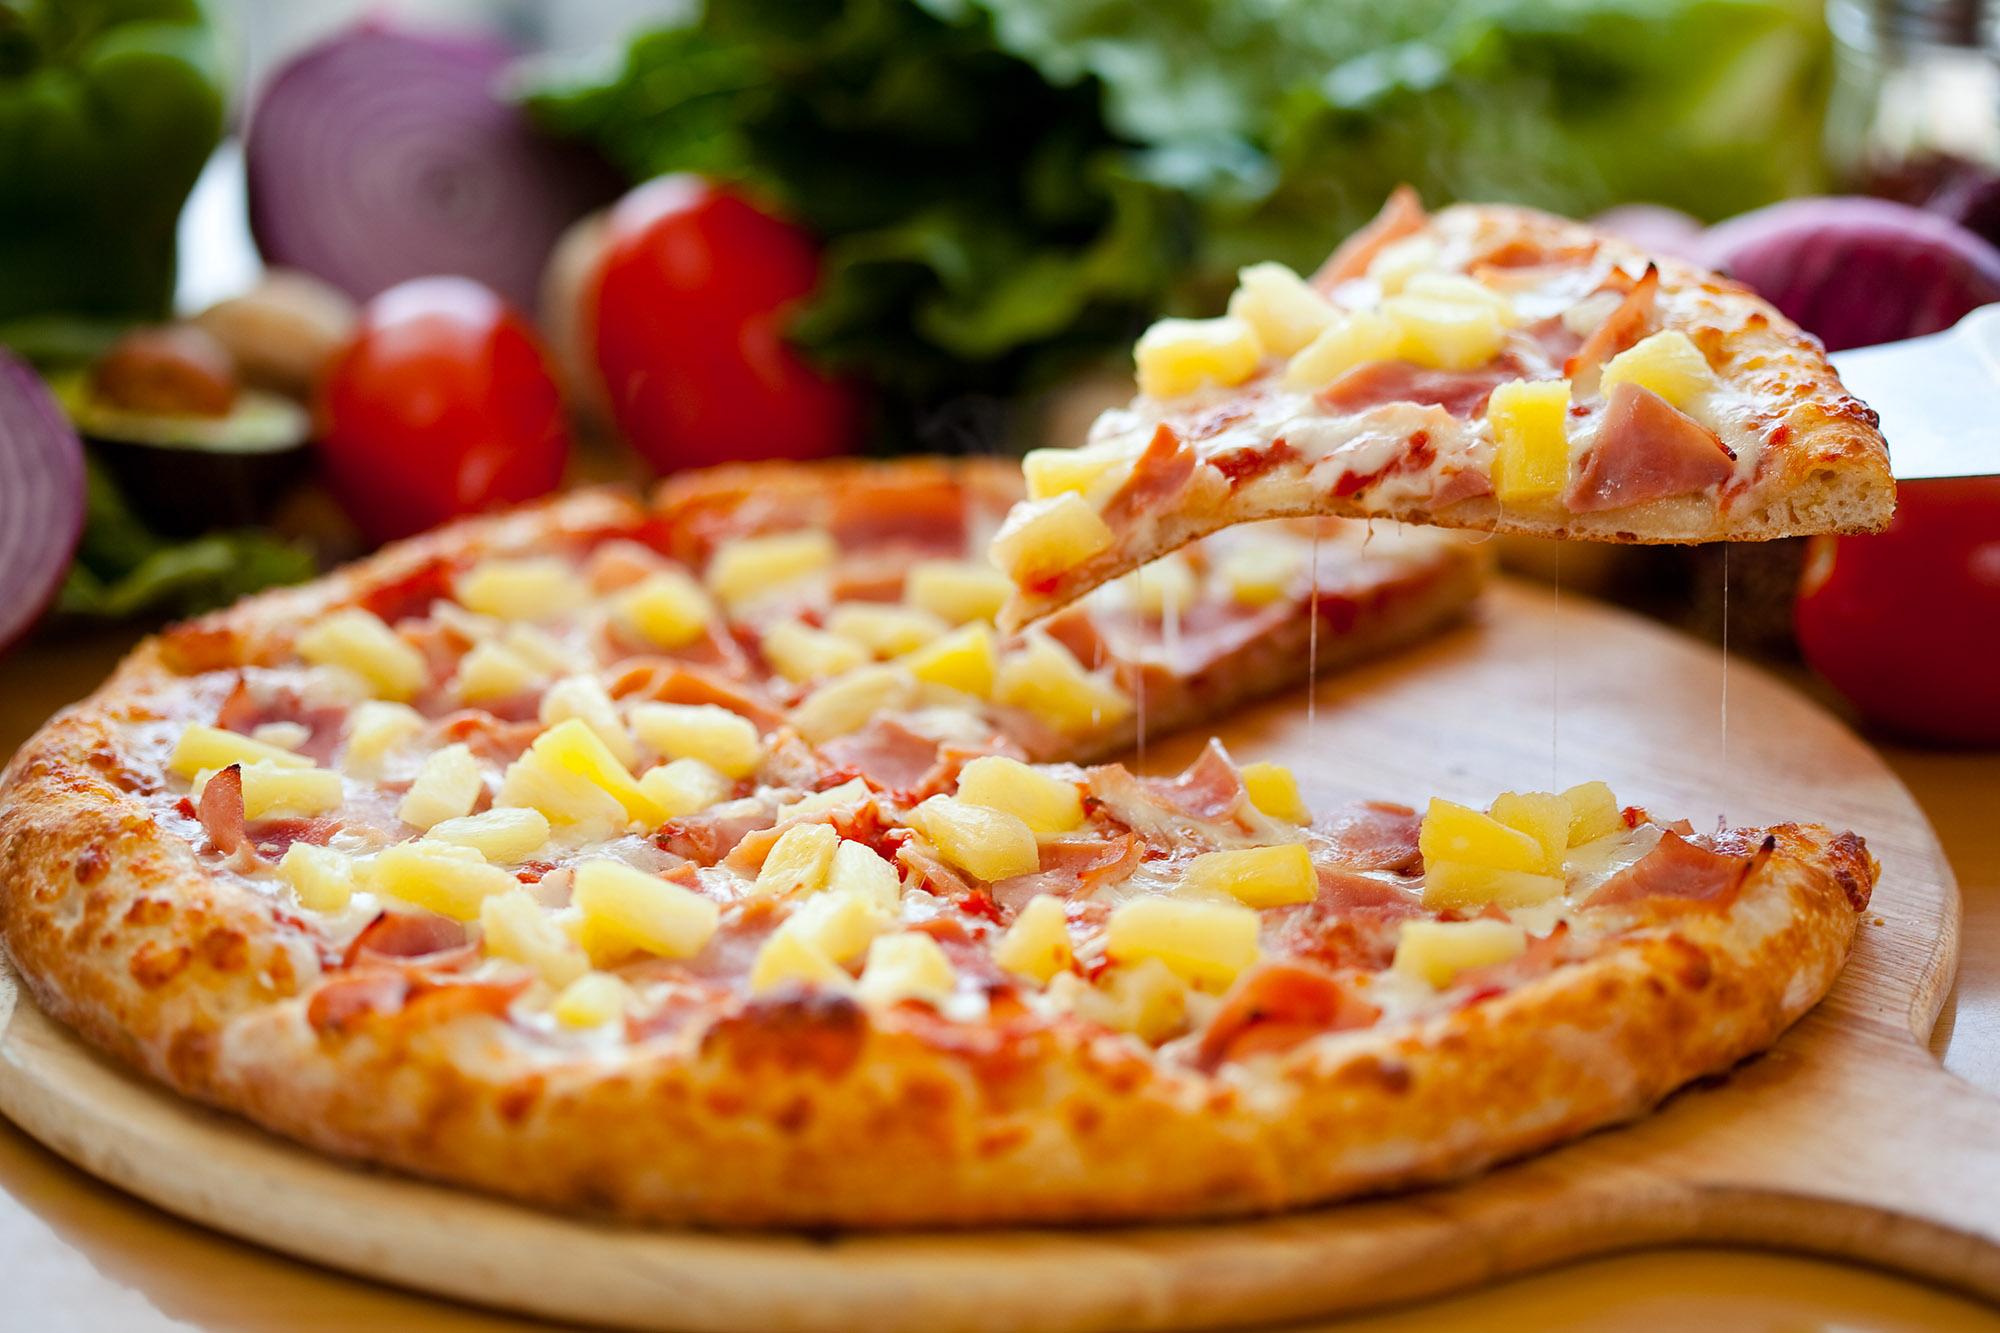 Blue apron techcrunch - Hawaiian Pizza Inventor Sam Panopoulos Has Died